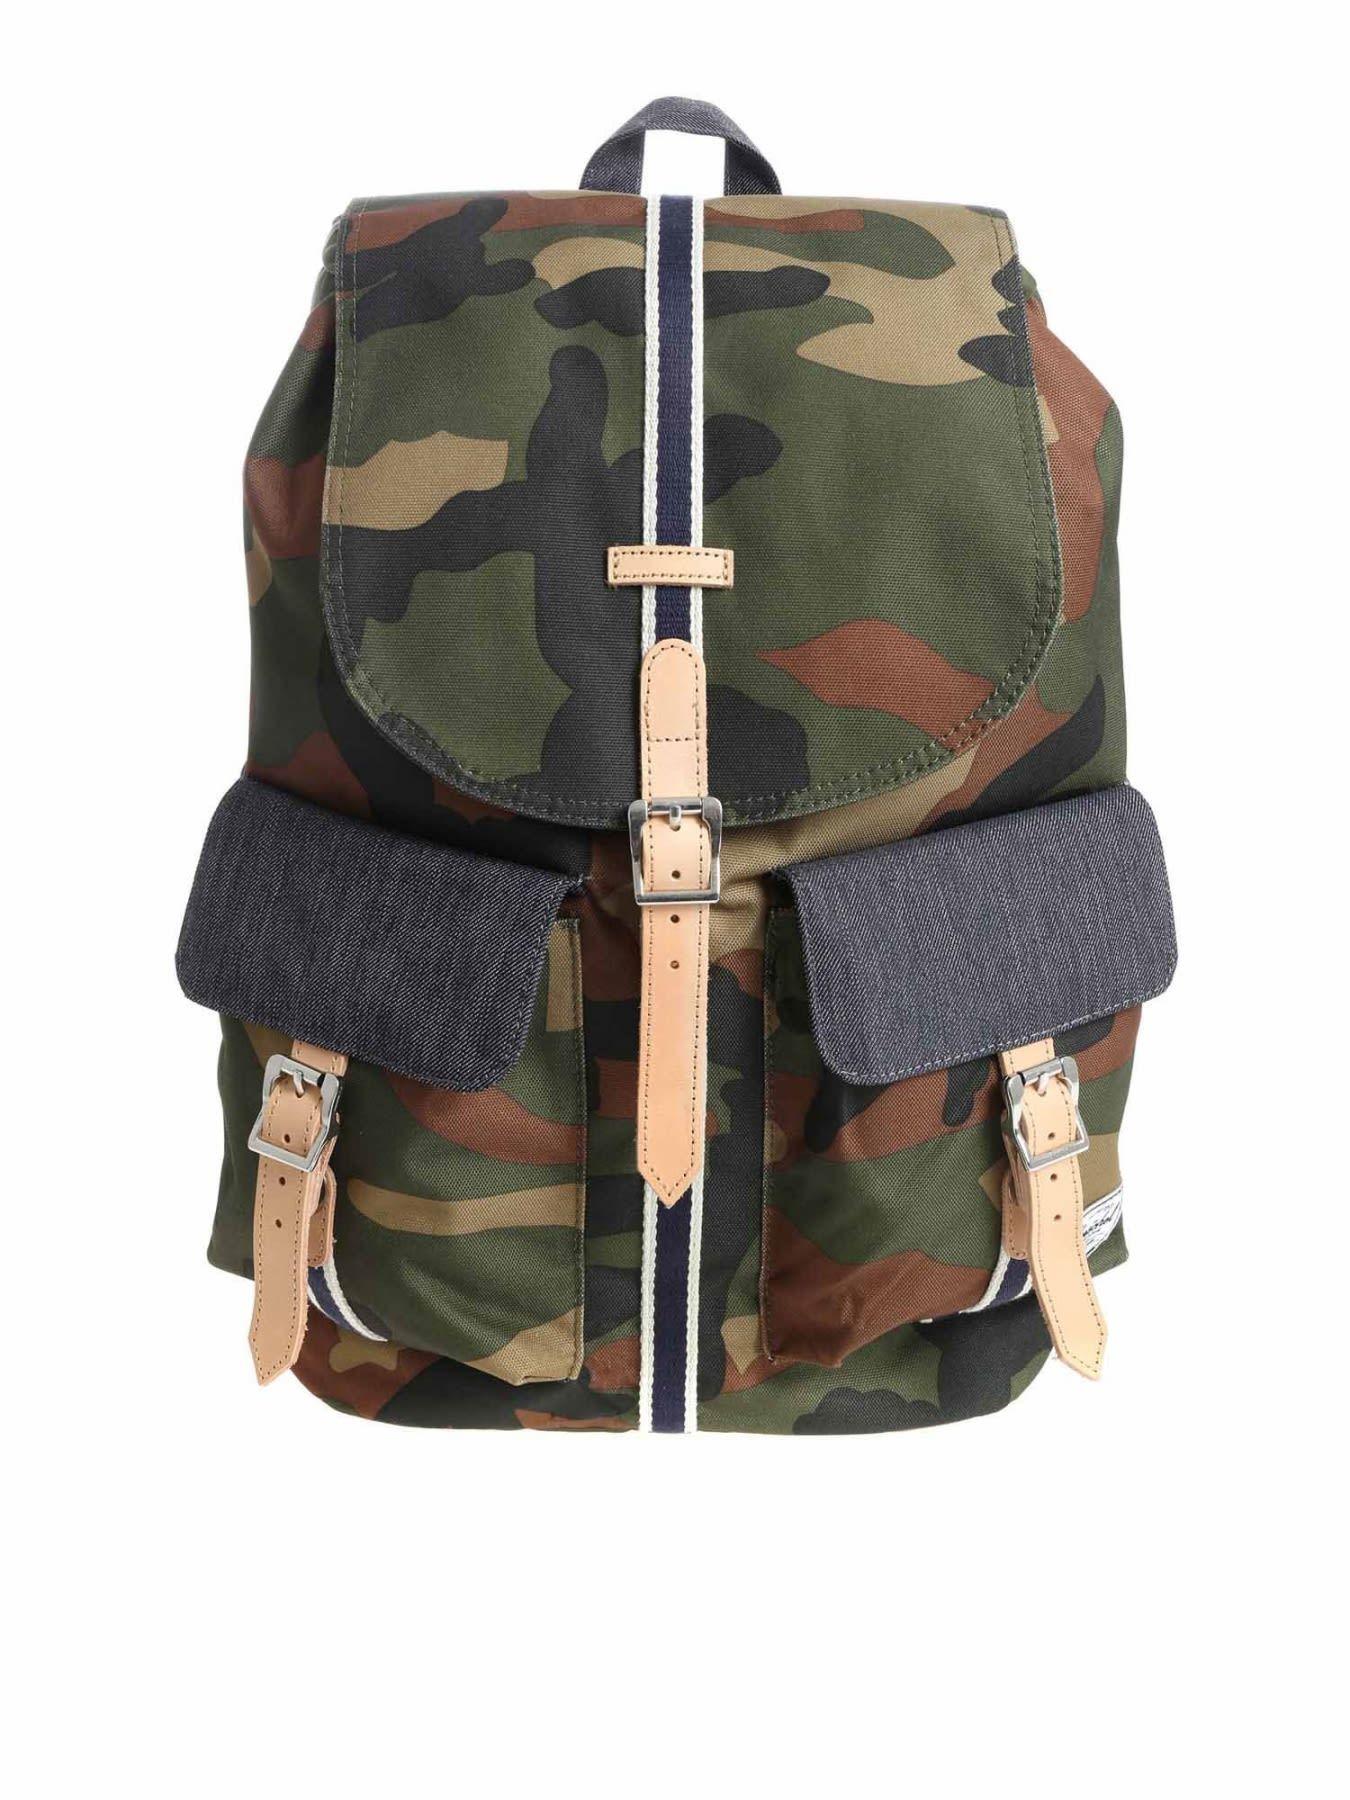 936c76b8c87 HERSCHEL SUPPLY CO. BACKPACK DAWSON.  herschelsupplyco.  bags  lining   polyester  backpacks